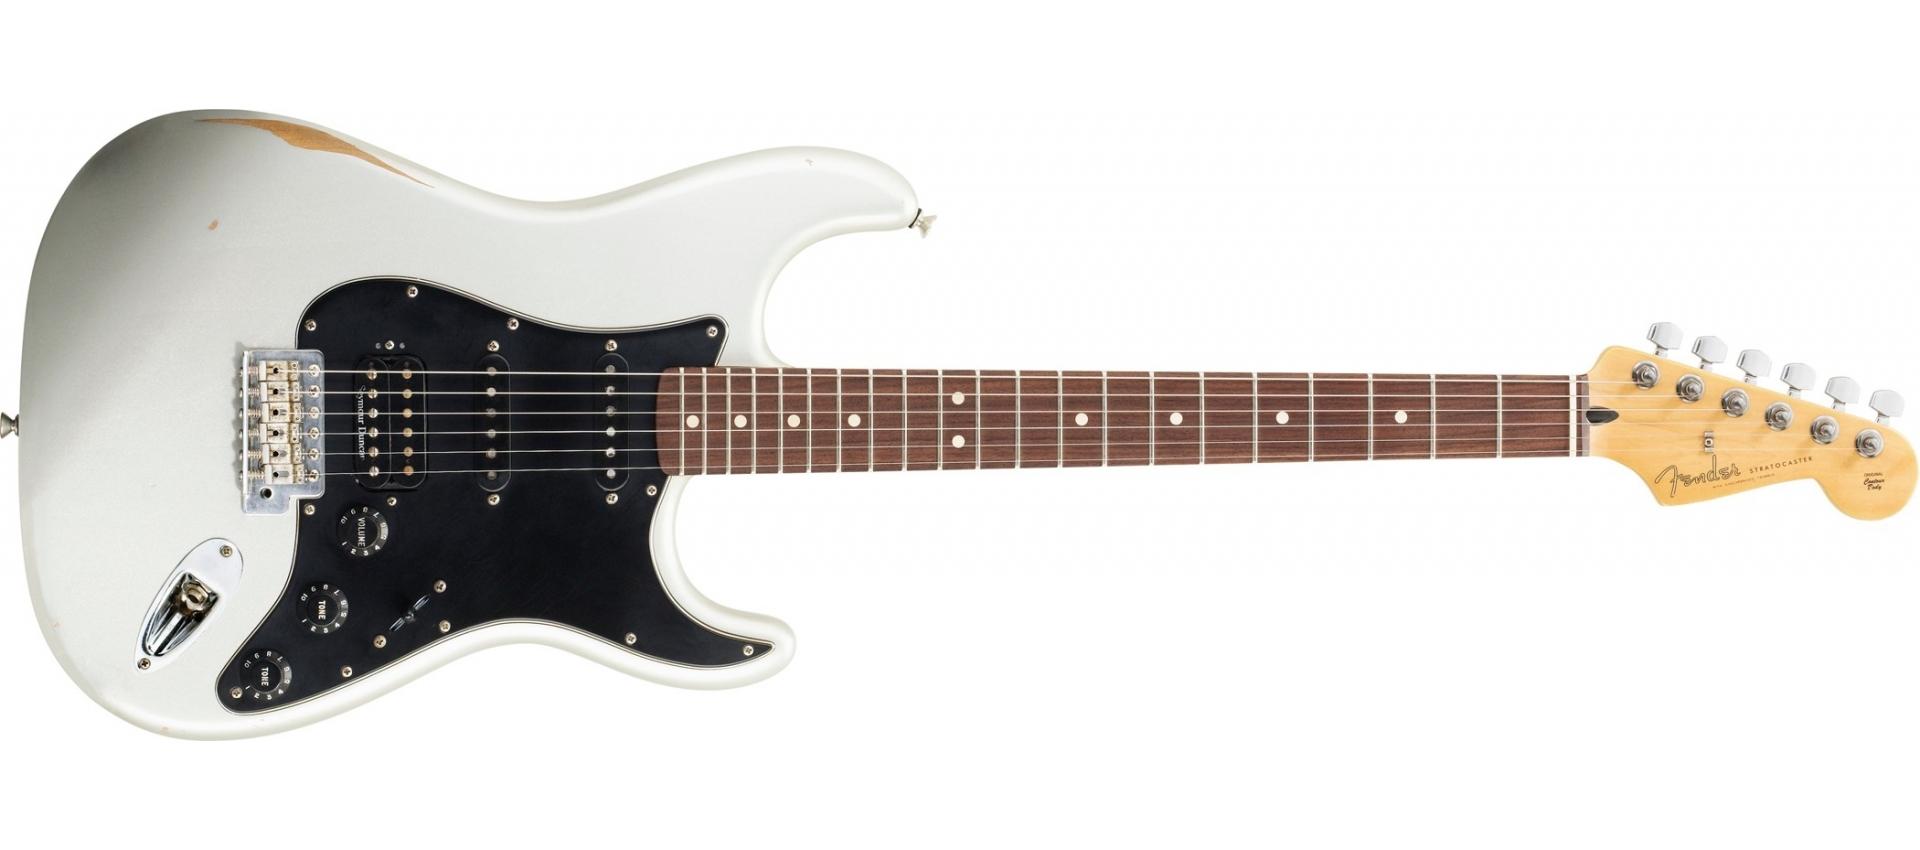 Fender Stratocaster Road Worn Player Hss Inca Silver